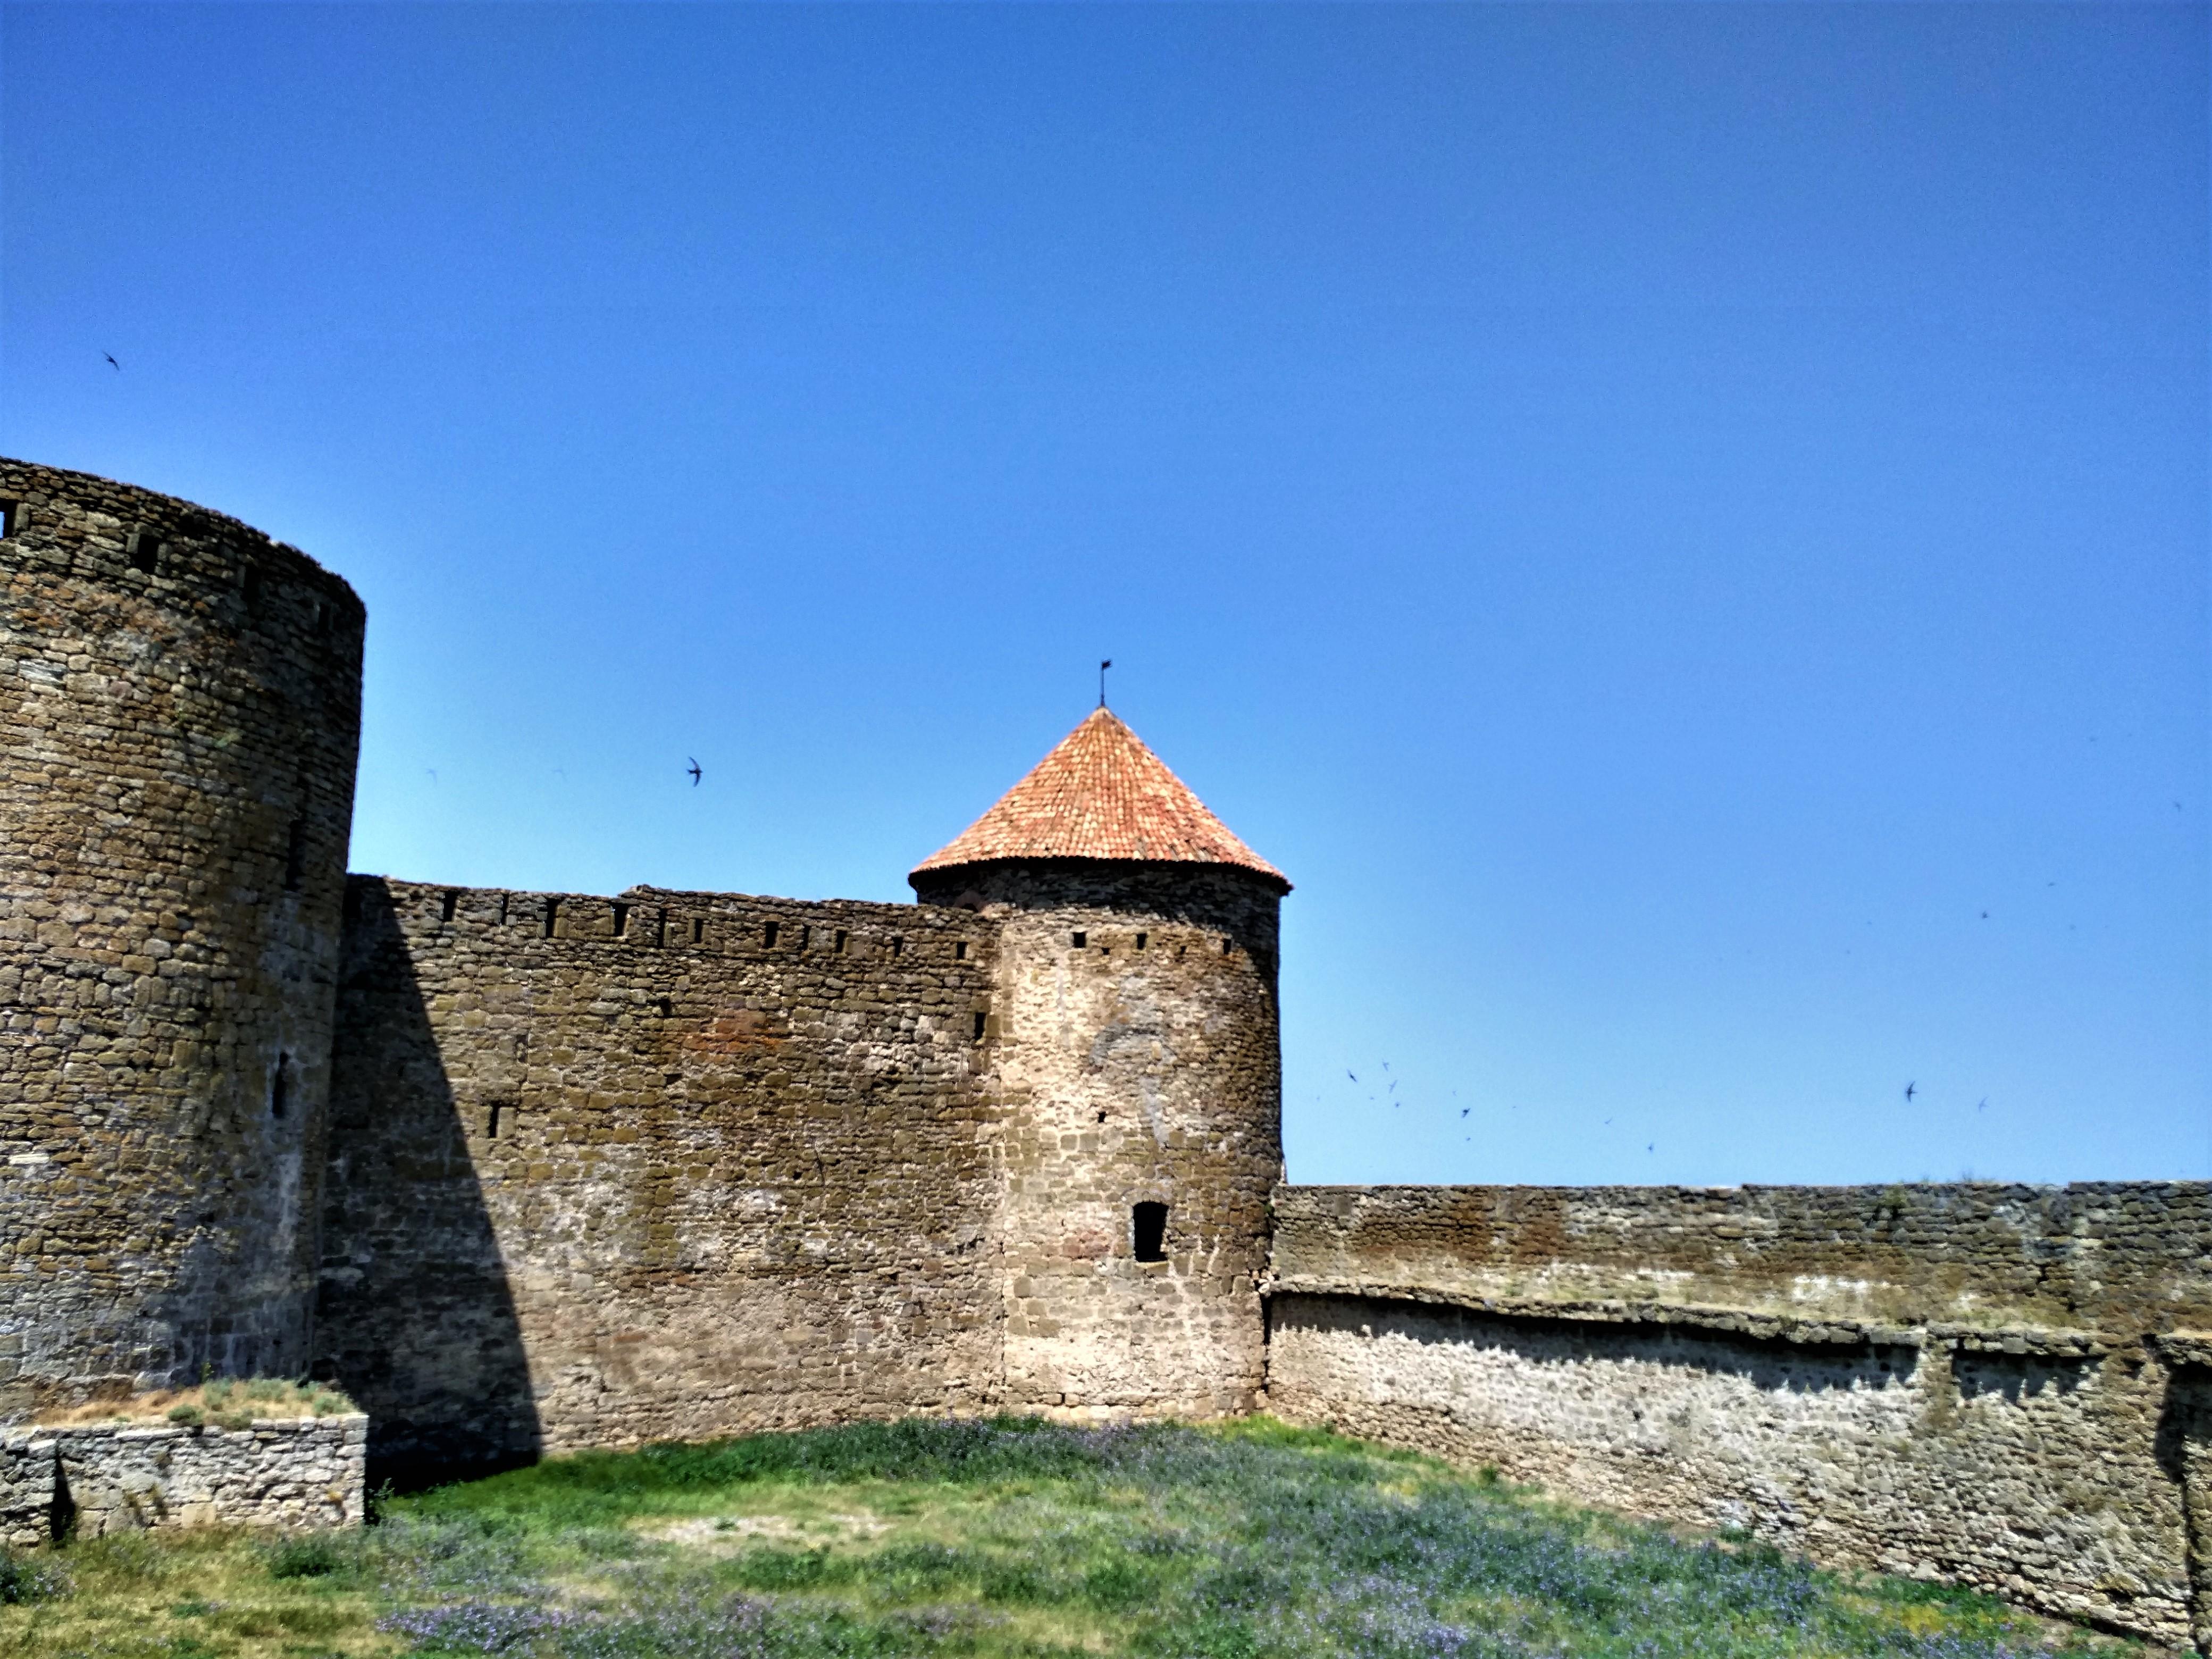 Akkerman Fortress: description, history 73